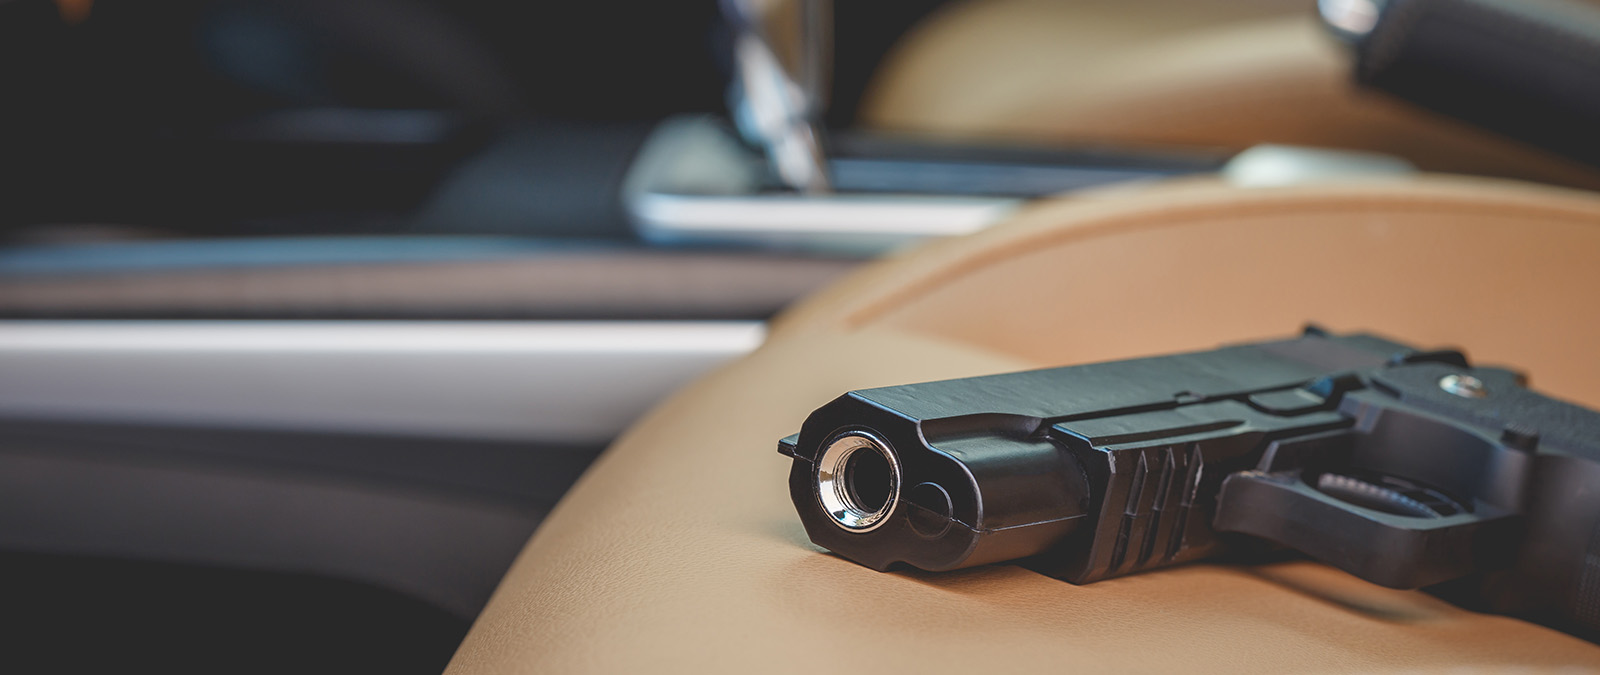 pelican consumer blog car travel handgun laws